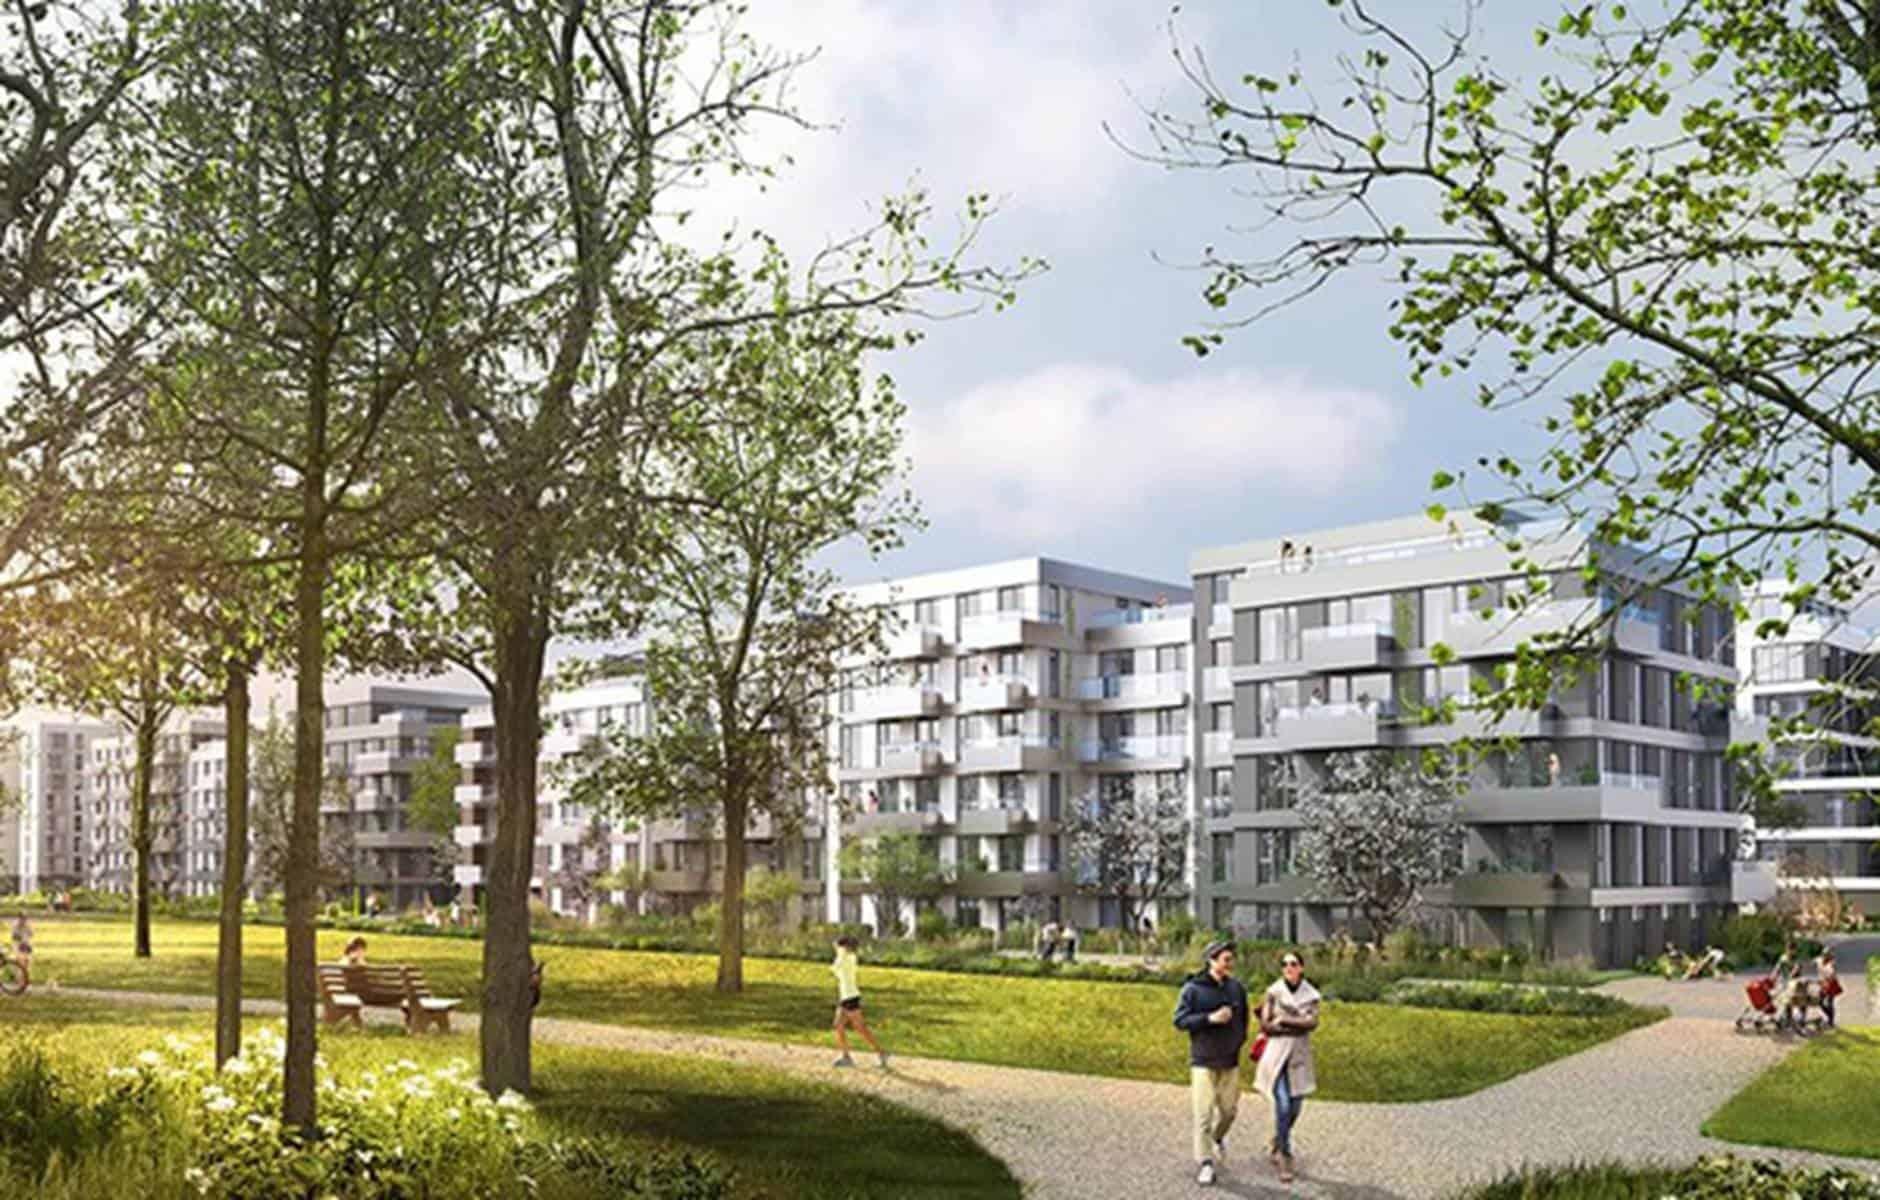 Luisenpark | Berlin Fliesendesign BFD